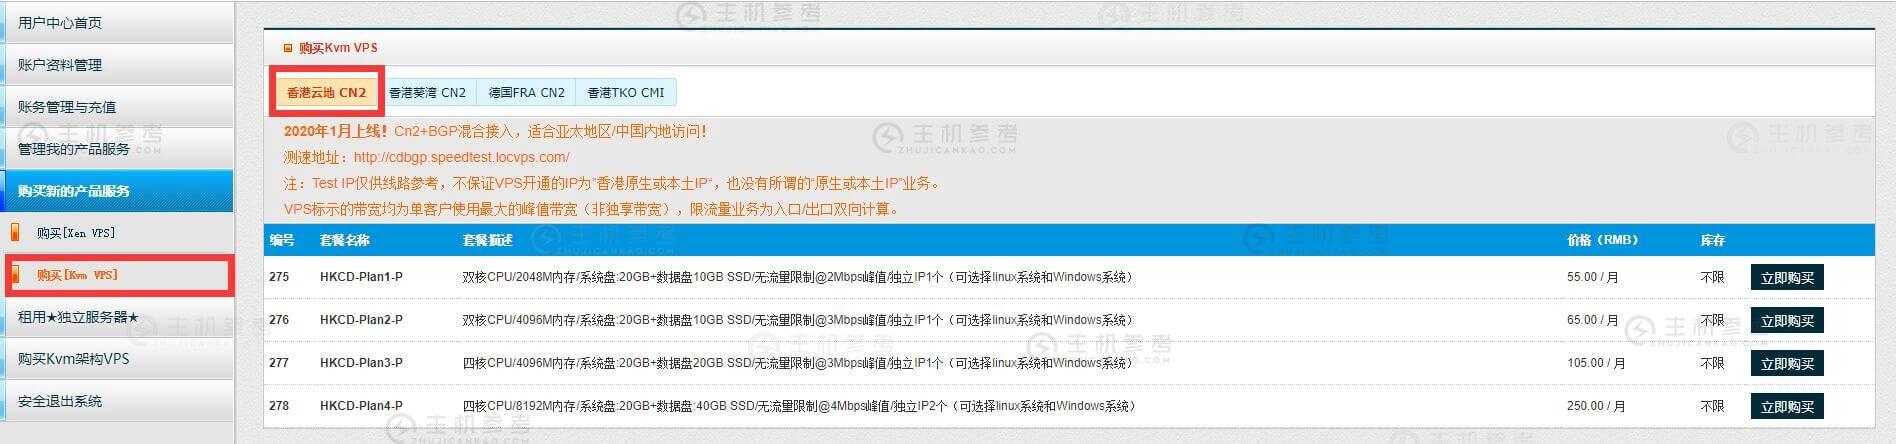 LOCVPS,高速稳定的香港云地CN2 VPS云服务器已上线,终身8折优惠,适用于免备案建站,2核心2G内存,44元每月-主机参考